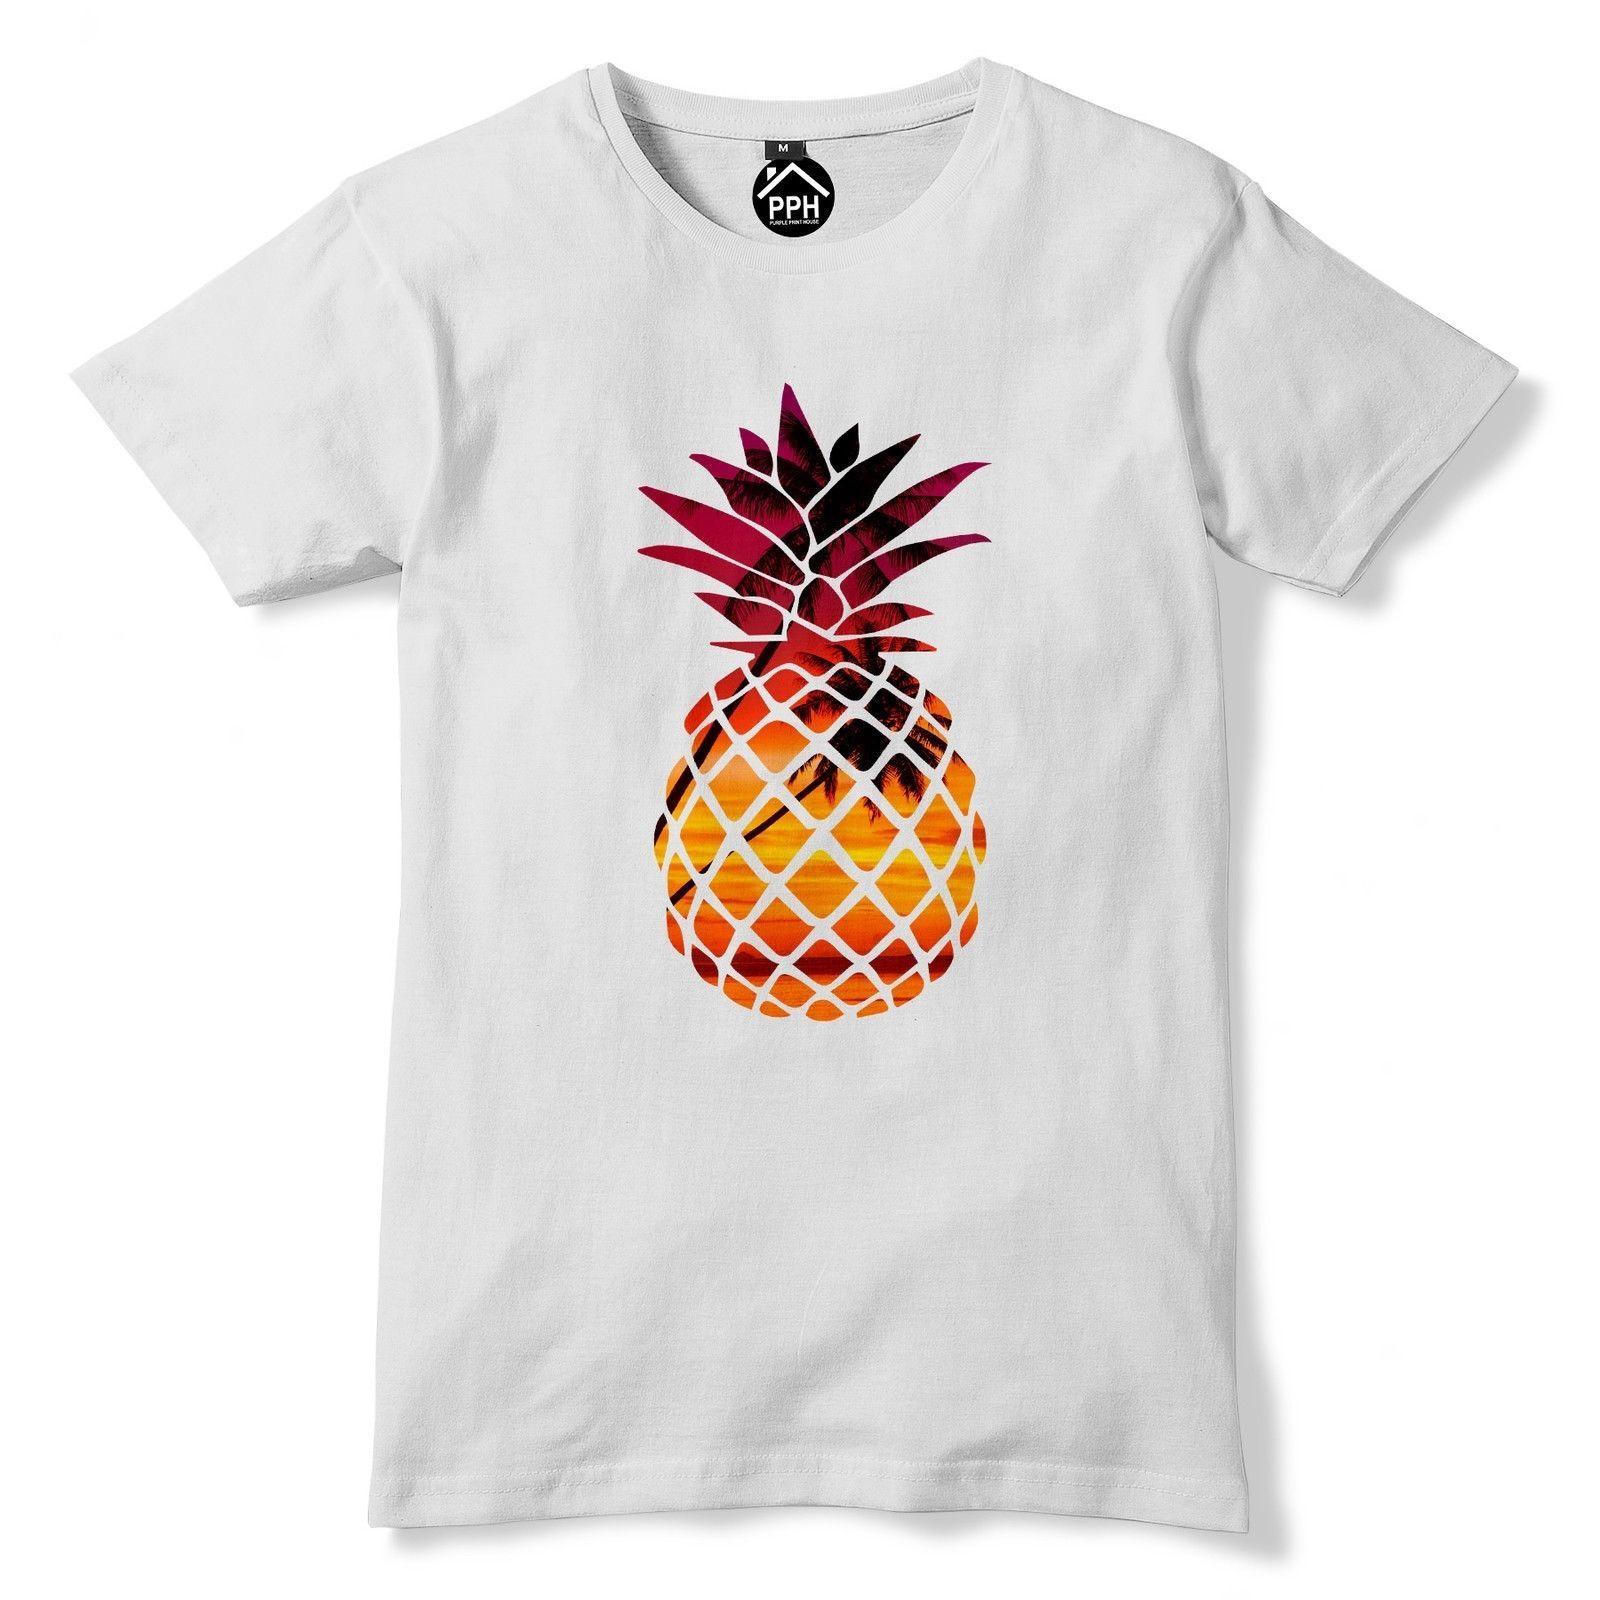 5aef012d Tropical Pineapple Fruit Tshirt Mens Womens T Shirt Exotic Summer Palm Tree  98 Tees Custom Jersey T Shirt Clever T Shirts Best Tee Shirts From Sixcup,  ...